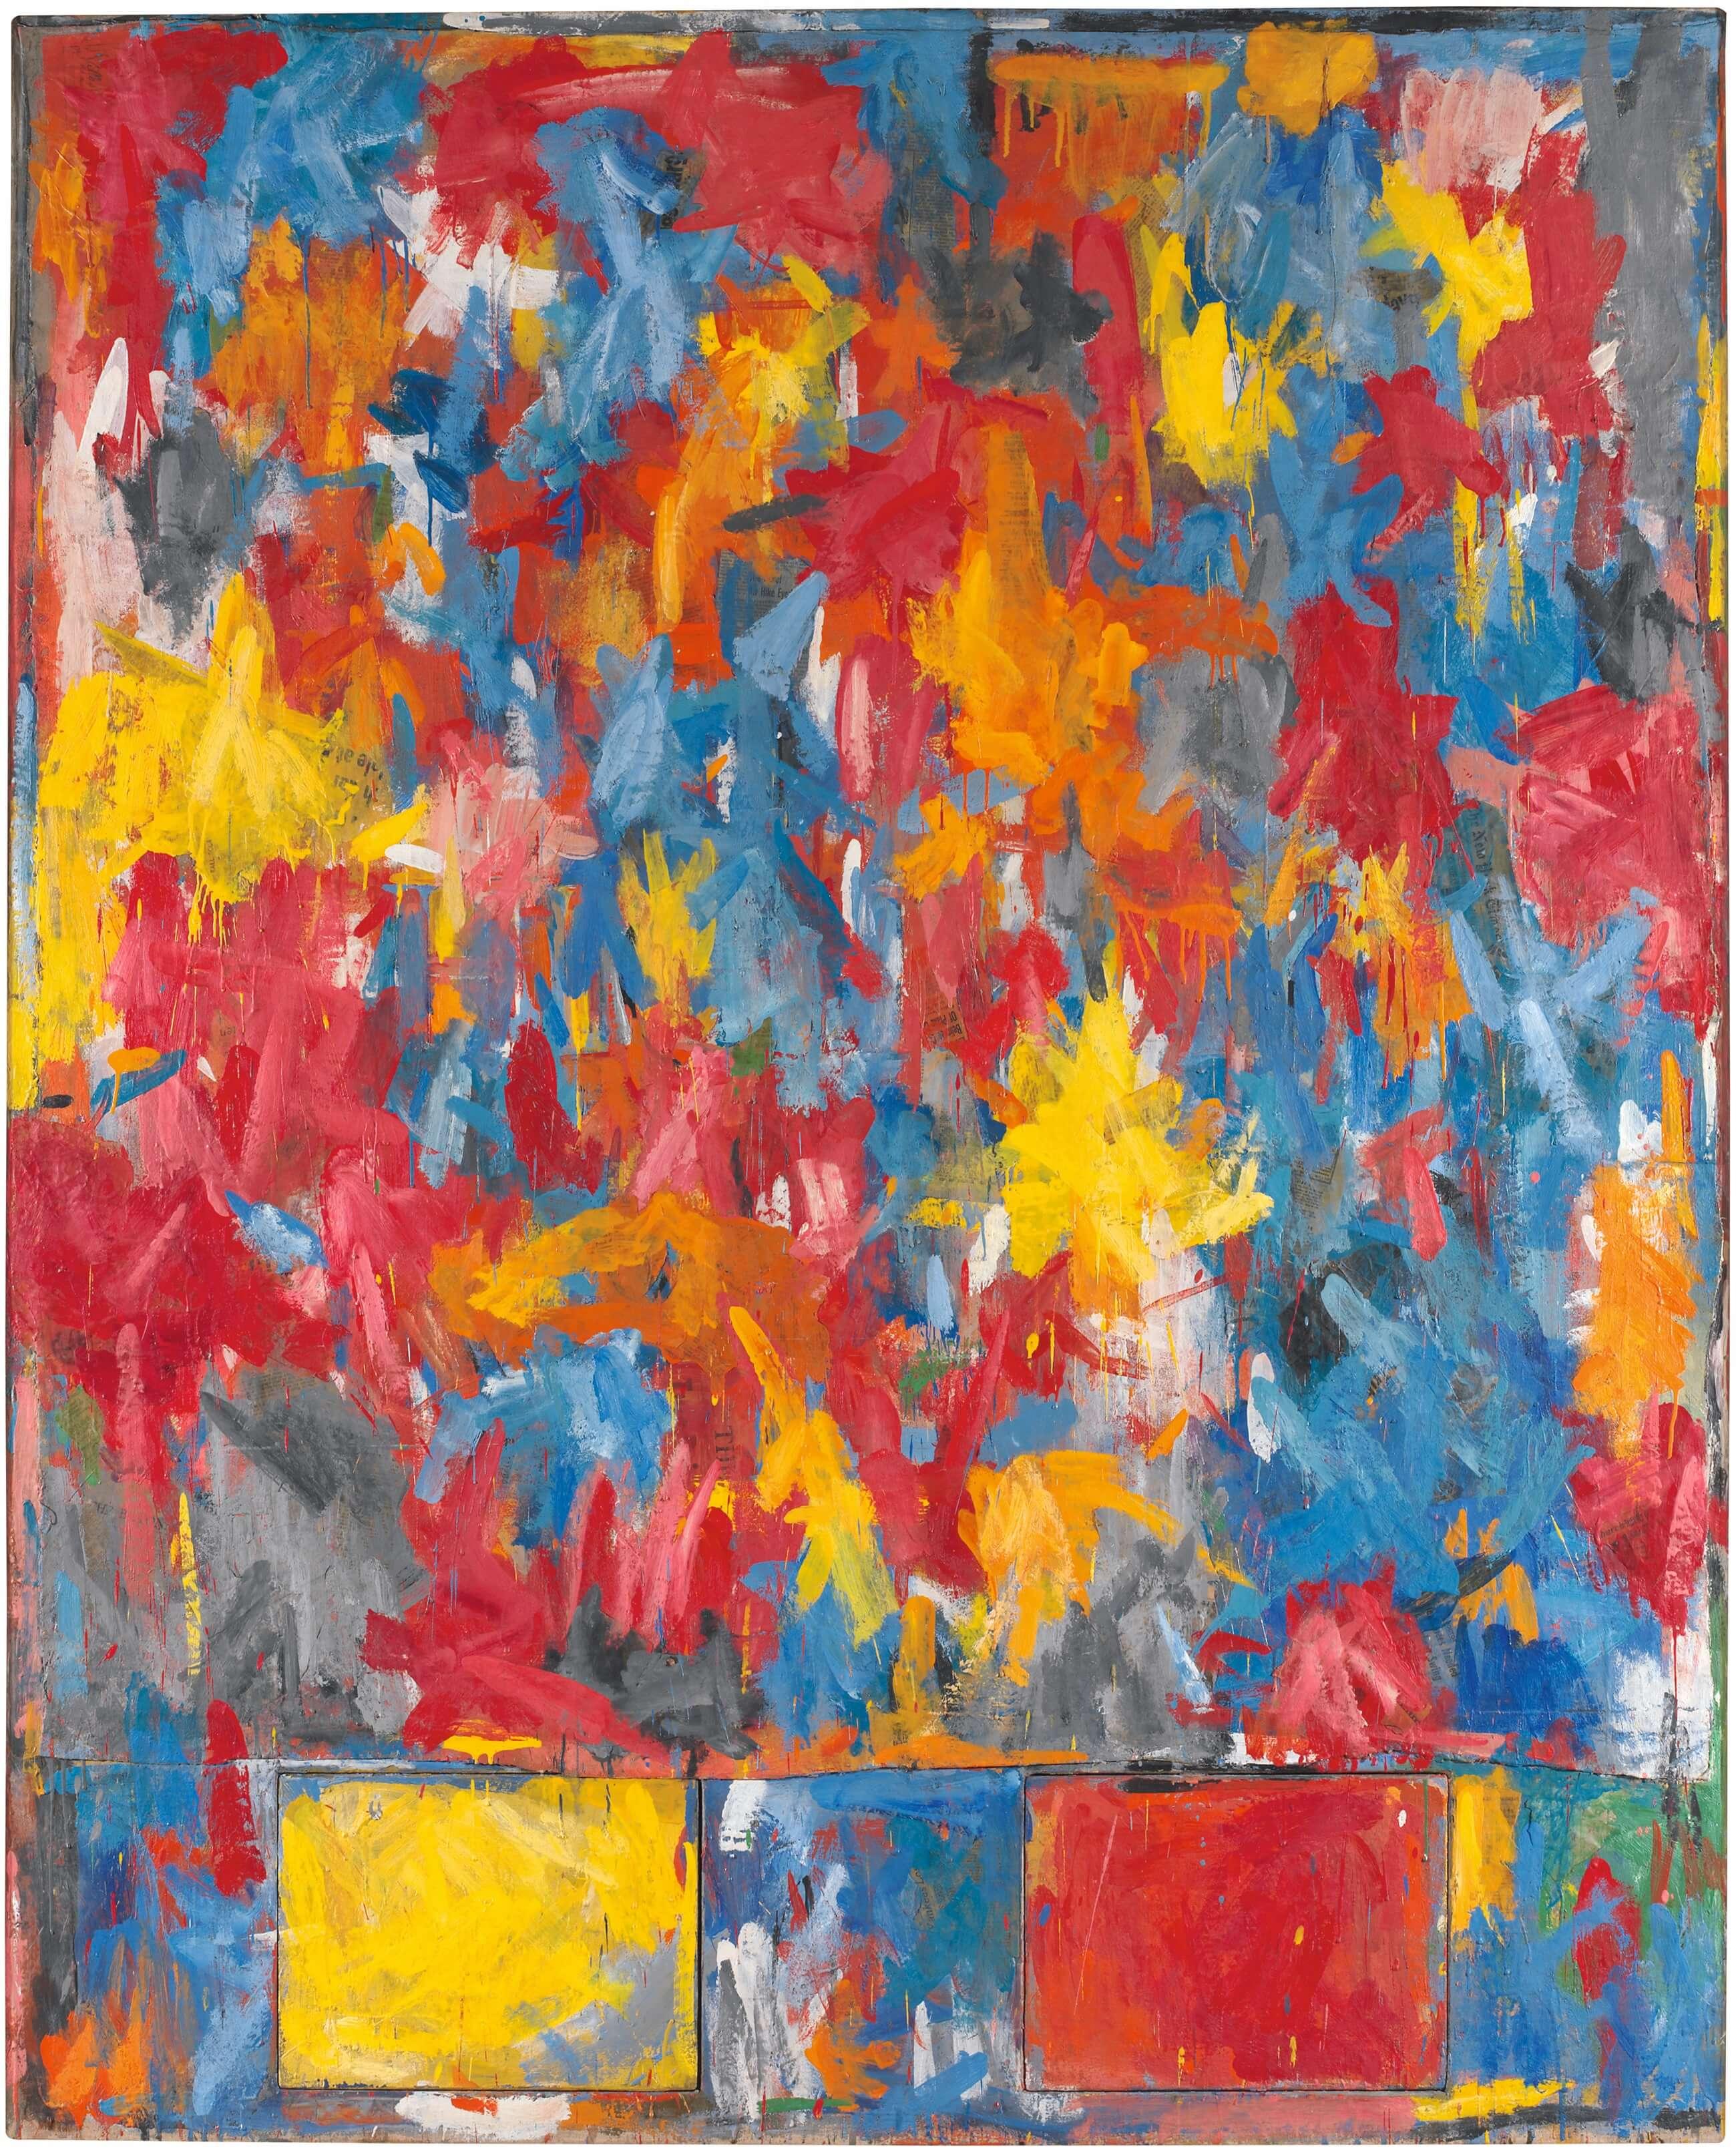 Highway, 1959, by Jasper Johns